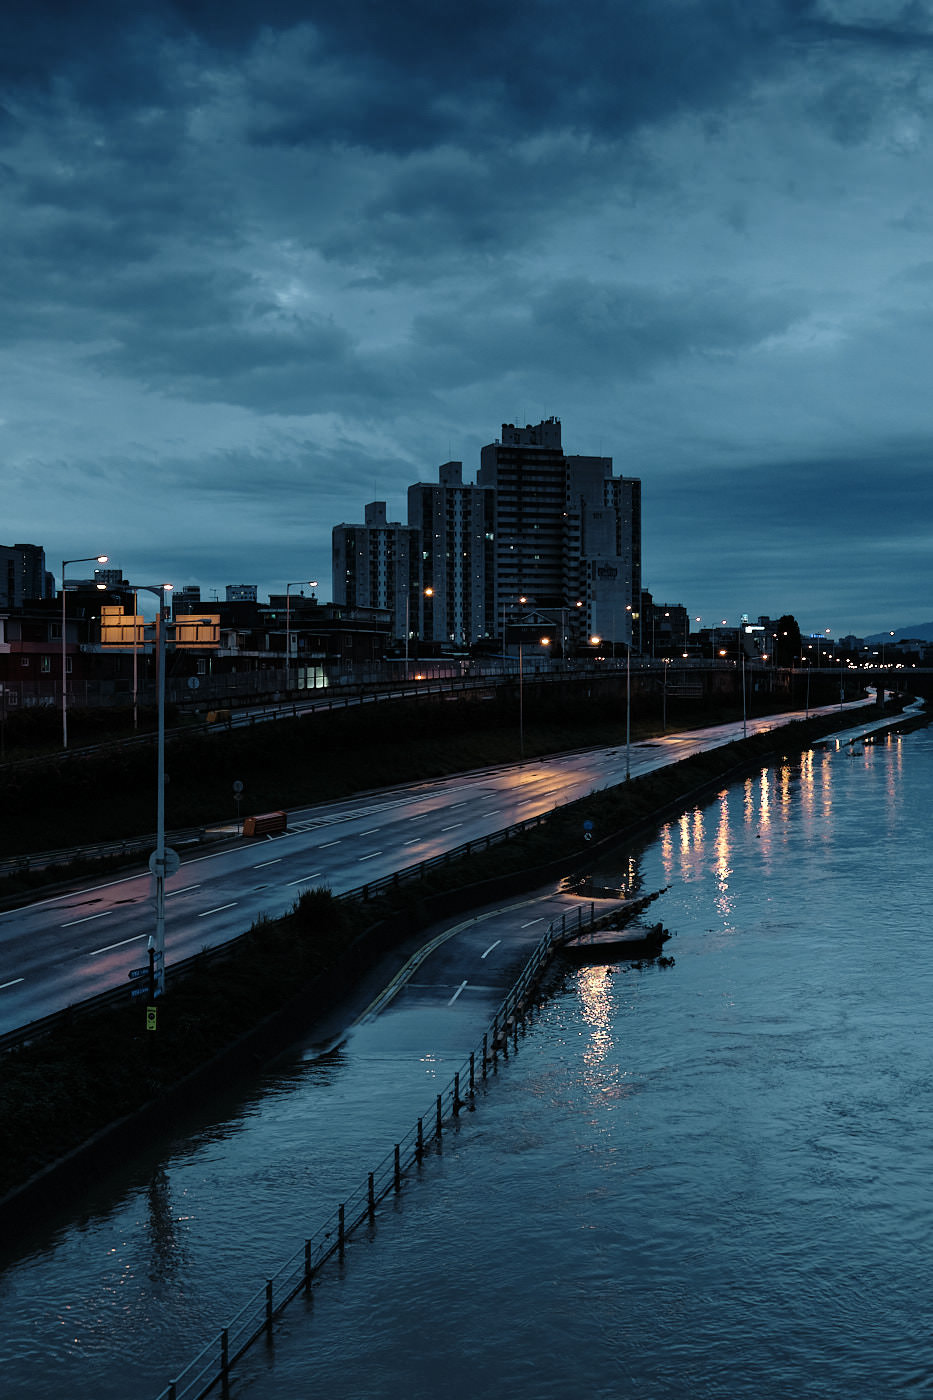 Bike Path Under Water - Seoul Floods 2020